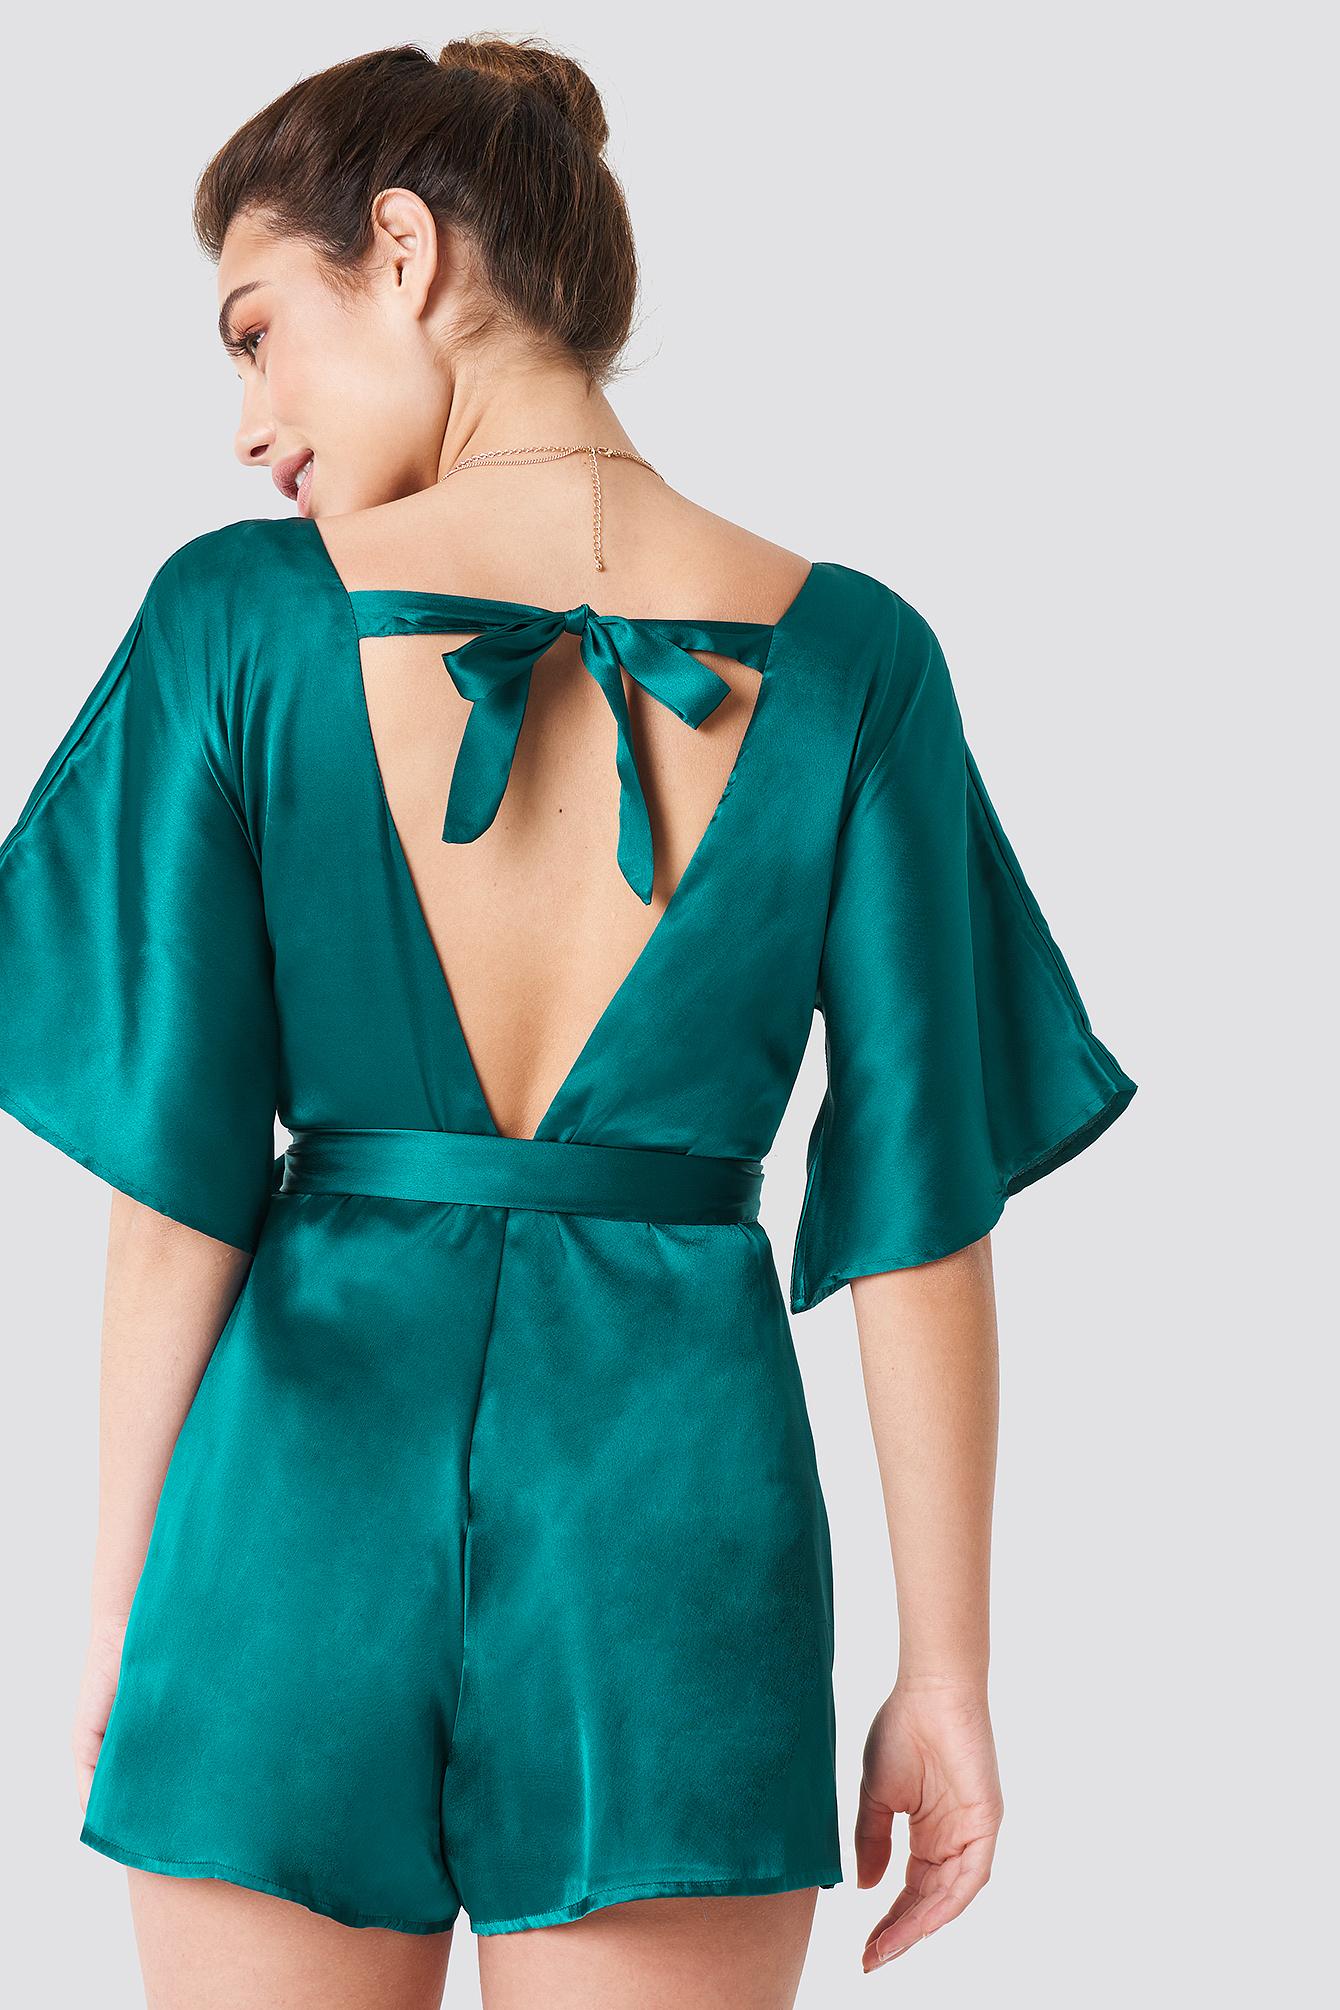 088df9bab93 Deep neck silky playsuit emerald green jpg 640x960 Silky playsuit